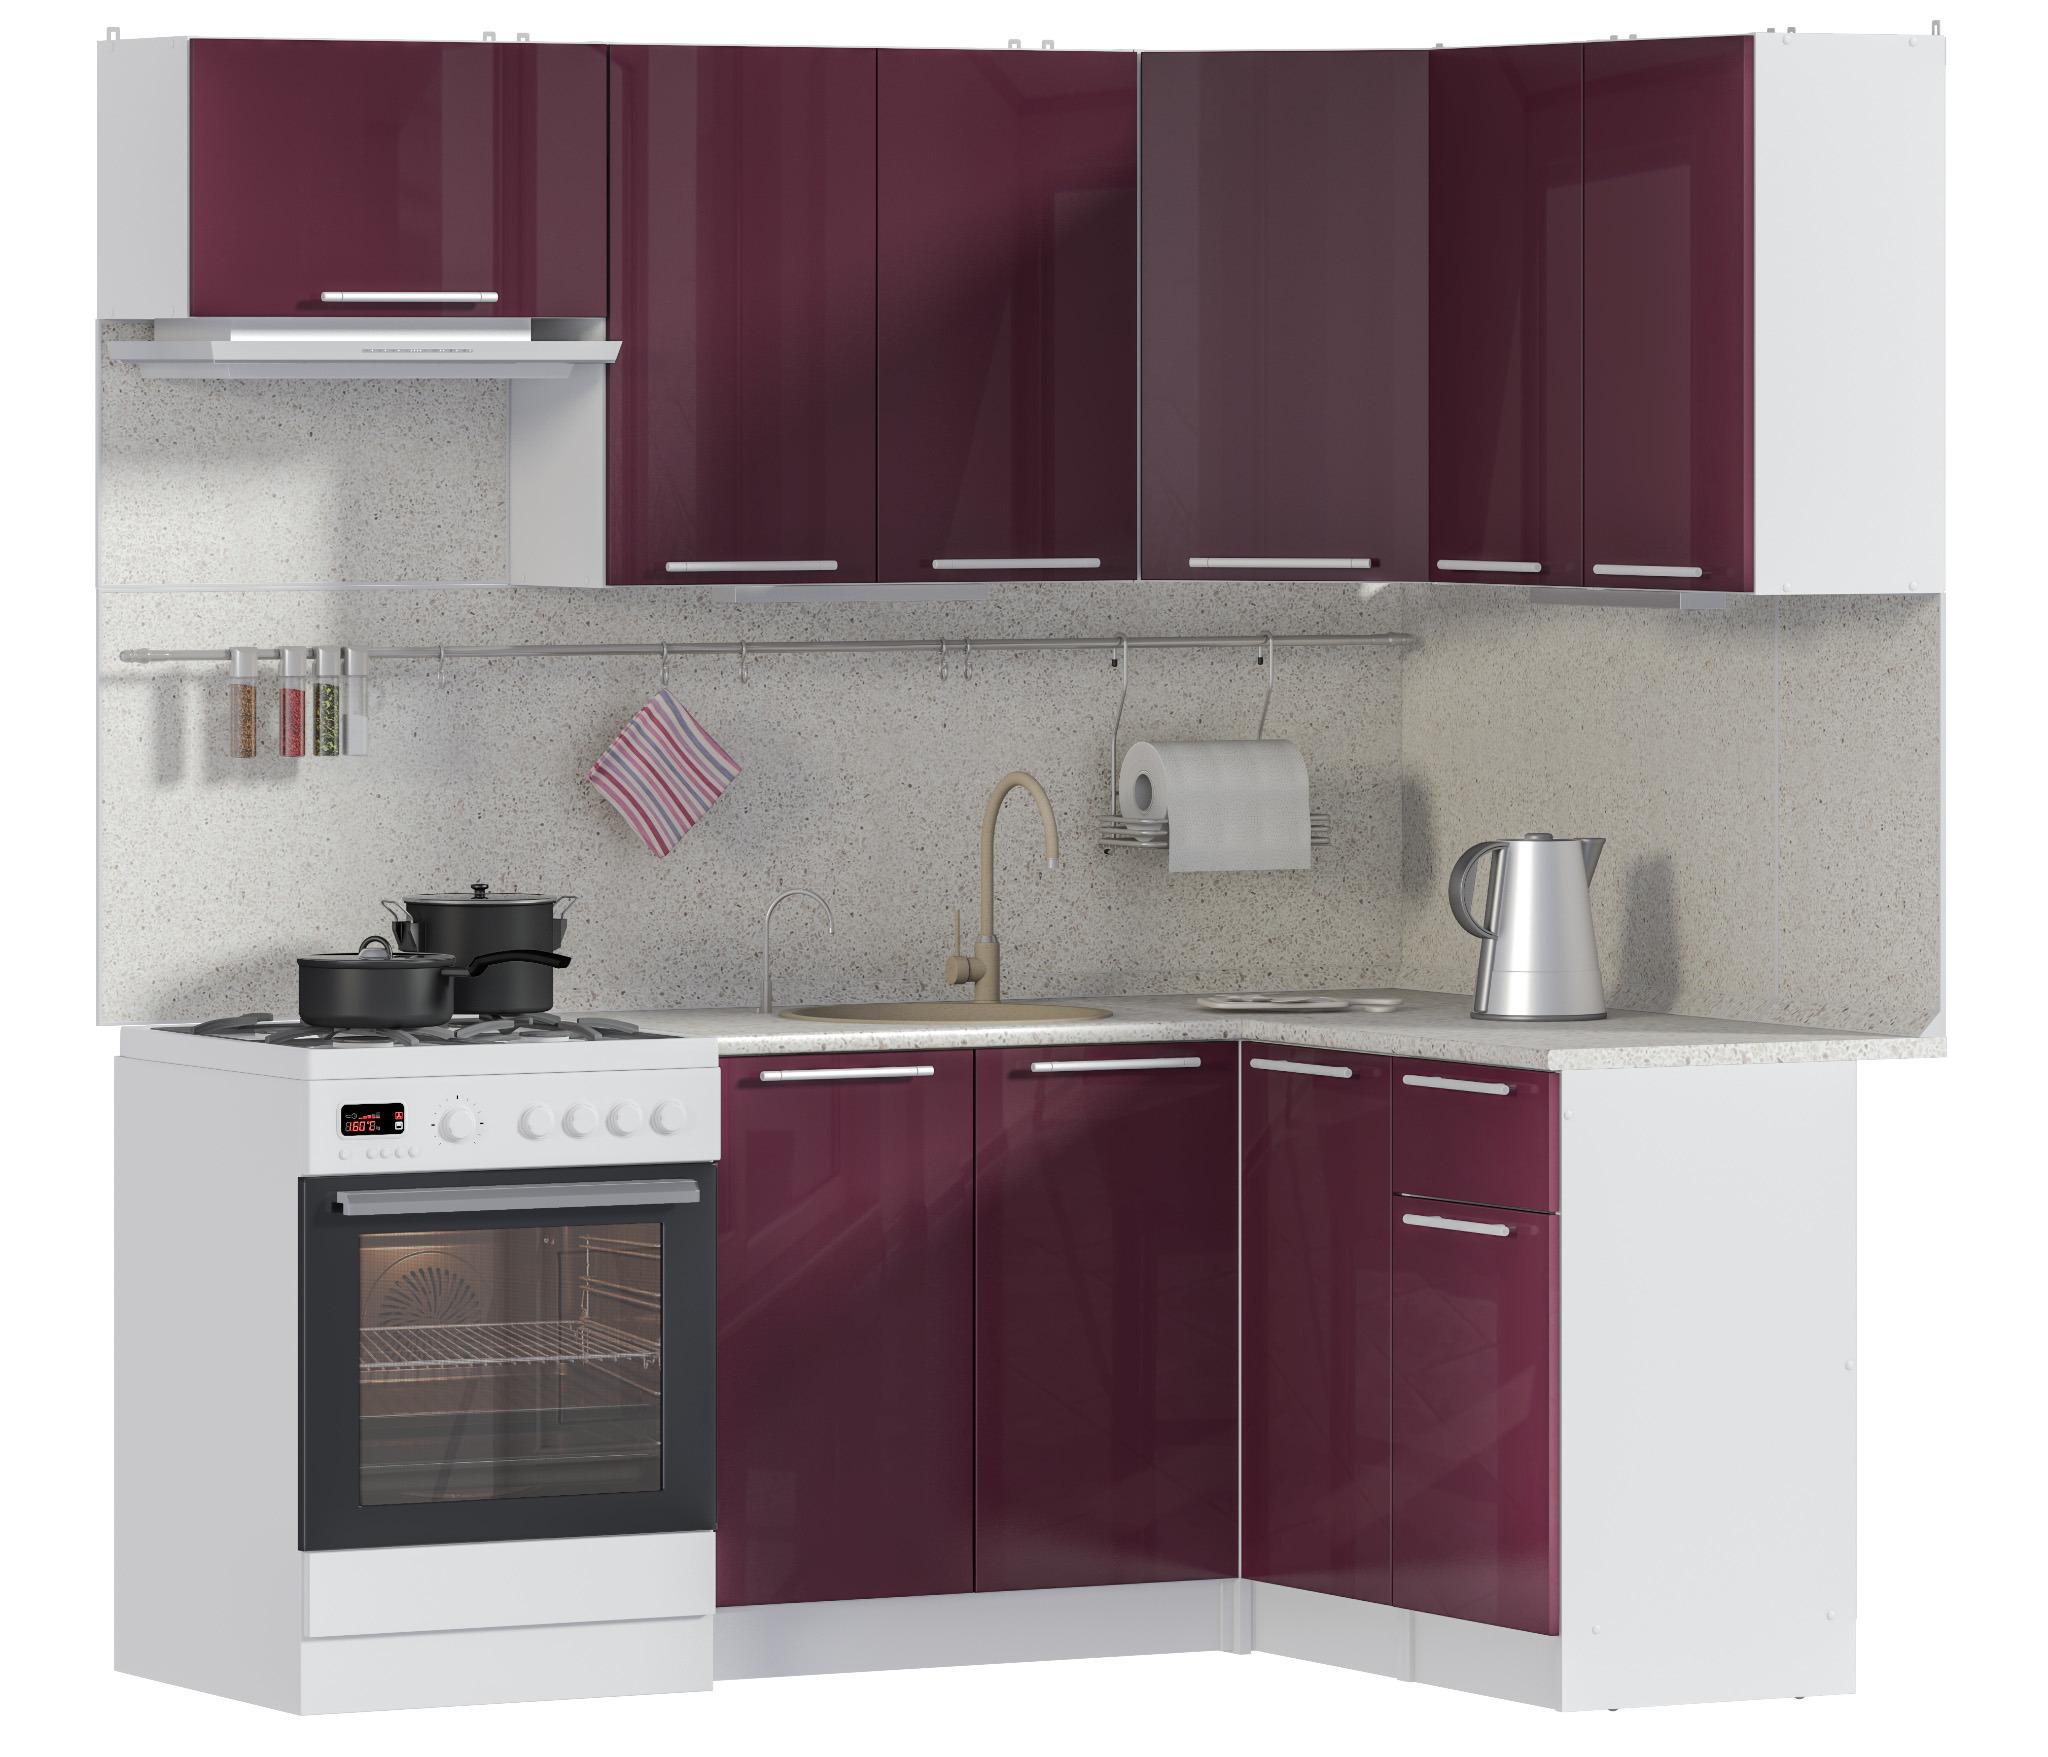 Ангелина кухня угловая 200*140 см БаклажанКухонные гарнитуры<br><br><br>Длина мм: 0<br>Высота мм: 0<br>Глубина мм: 0